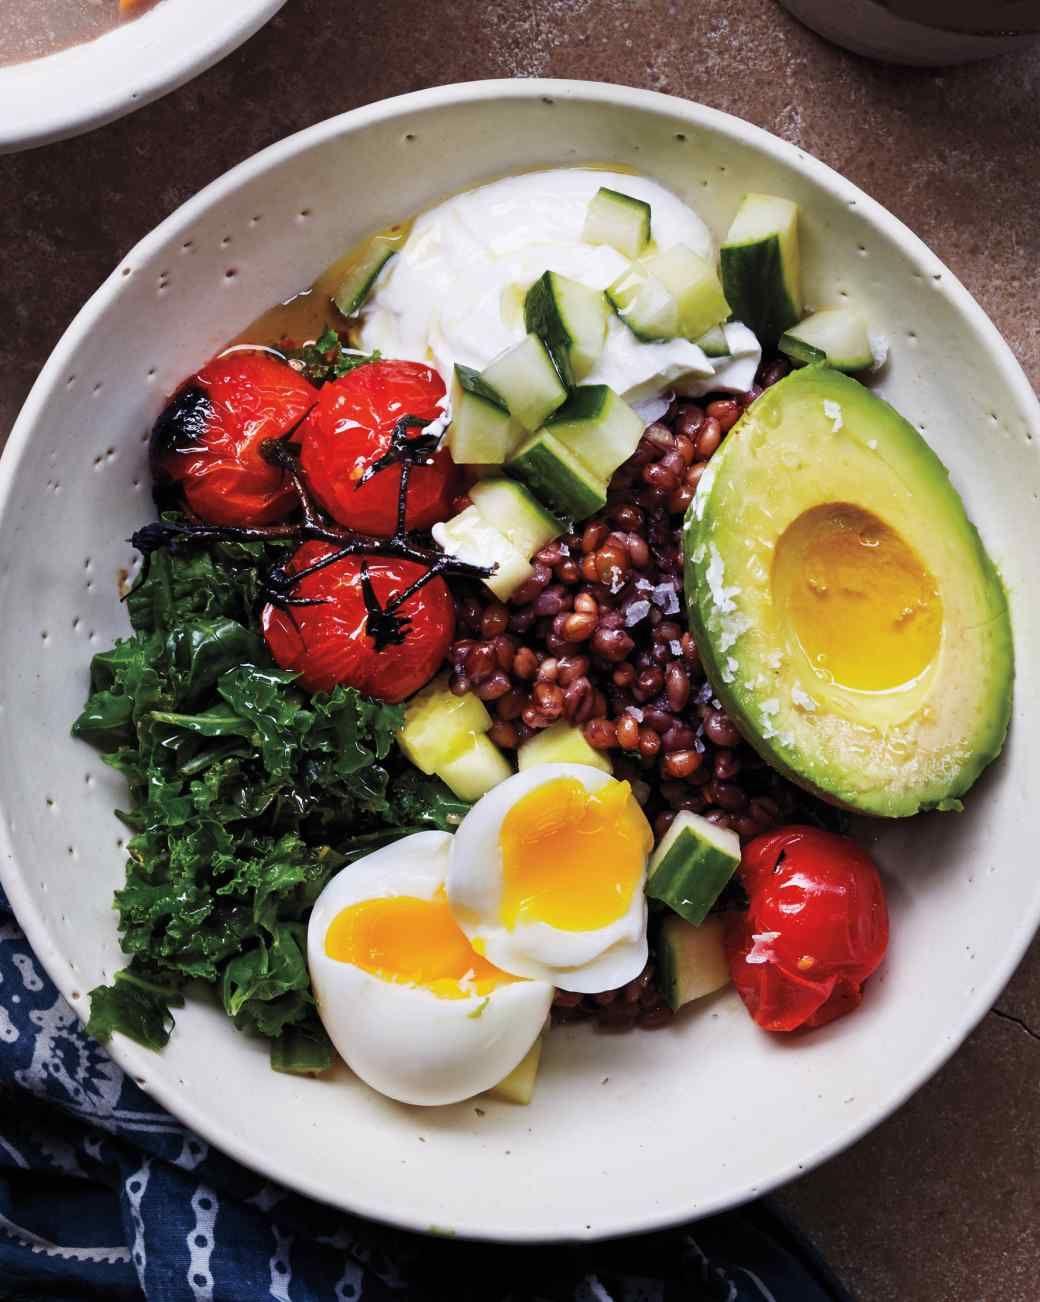 Savory Breakfast Bowl (kale, cherry tomatoes, eggs, avocado, barley)